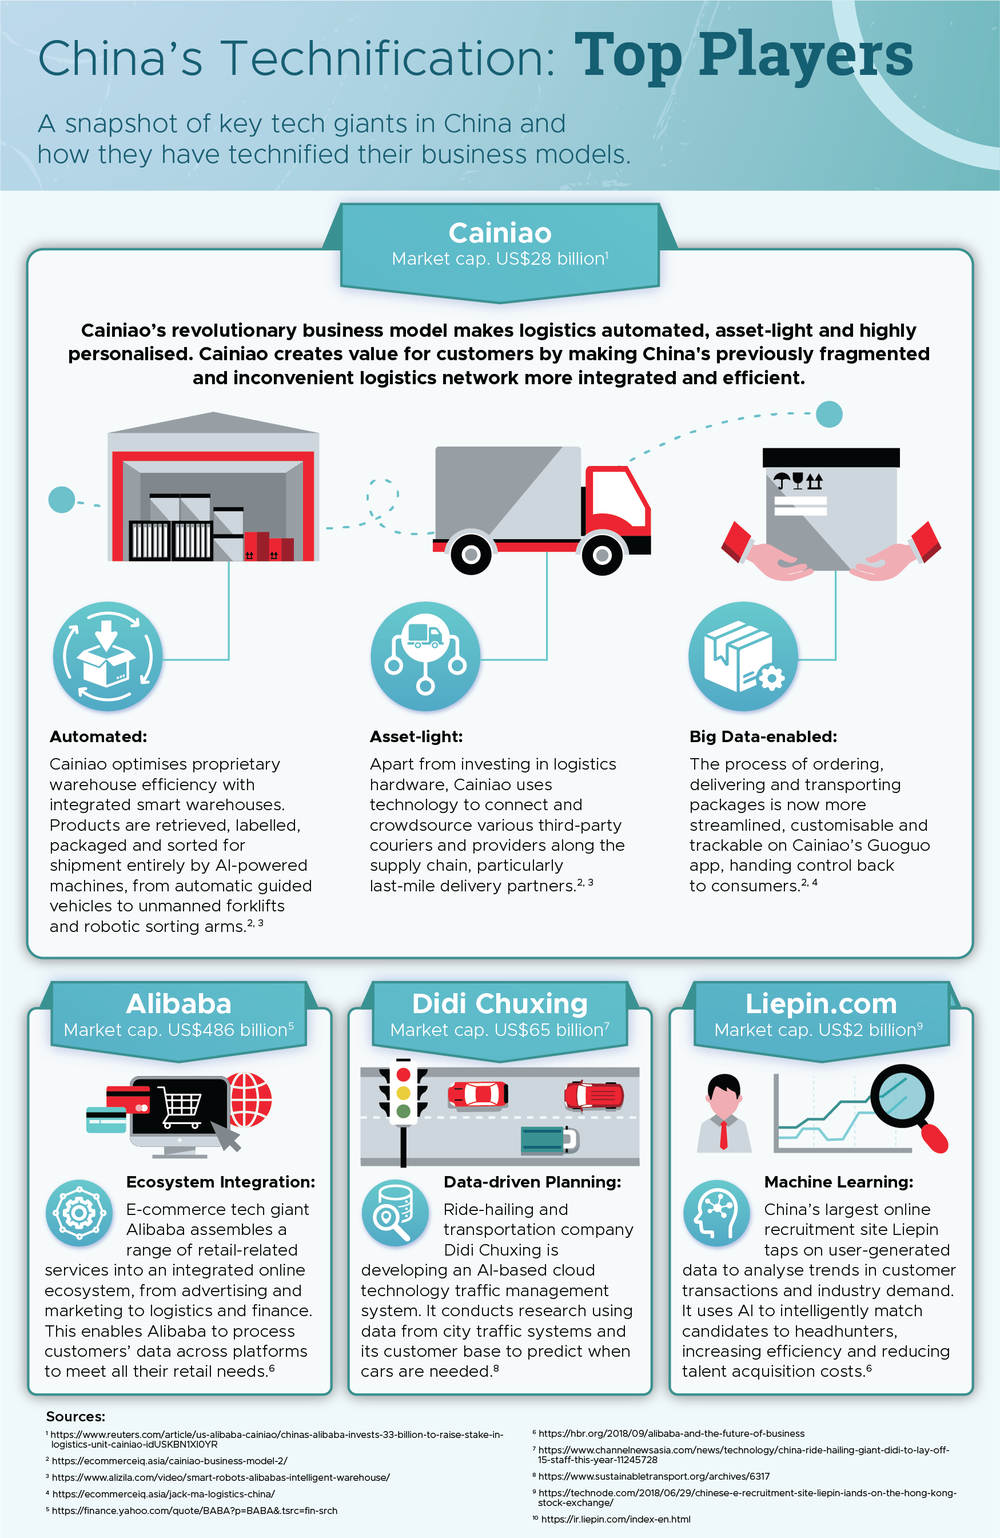 China Technification - Cainiao, Alibaba, DIdi Chuxing, Liepin